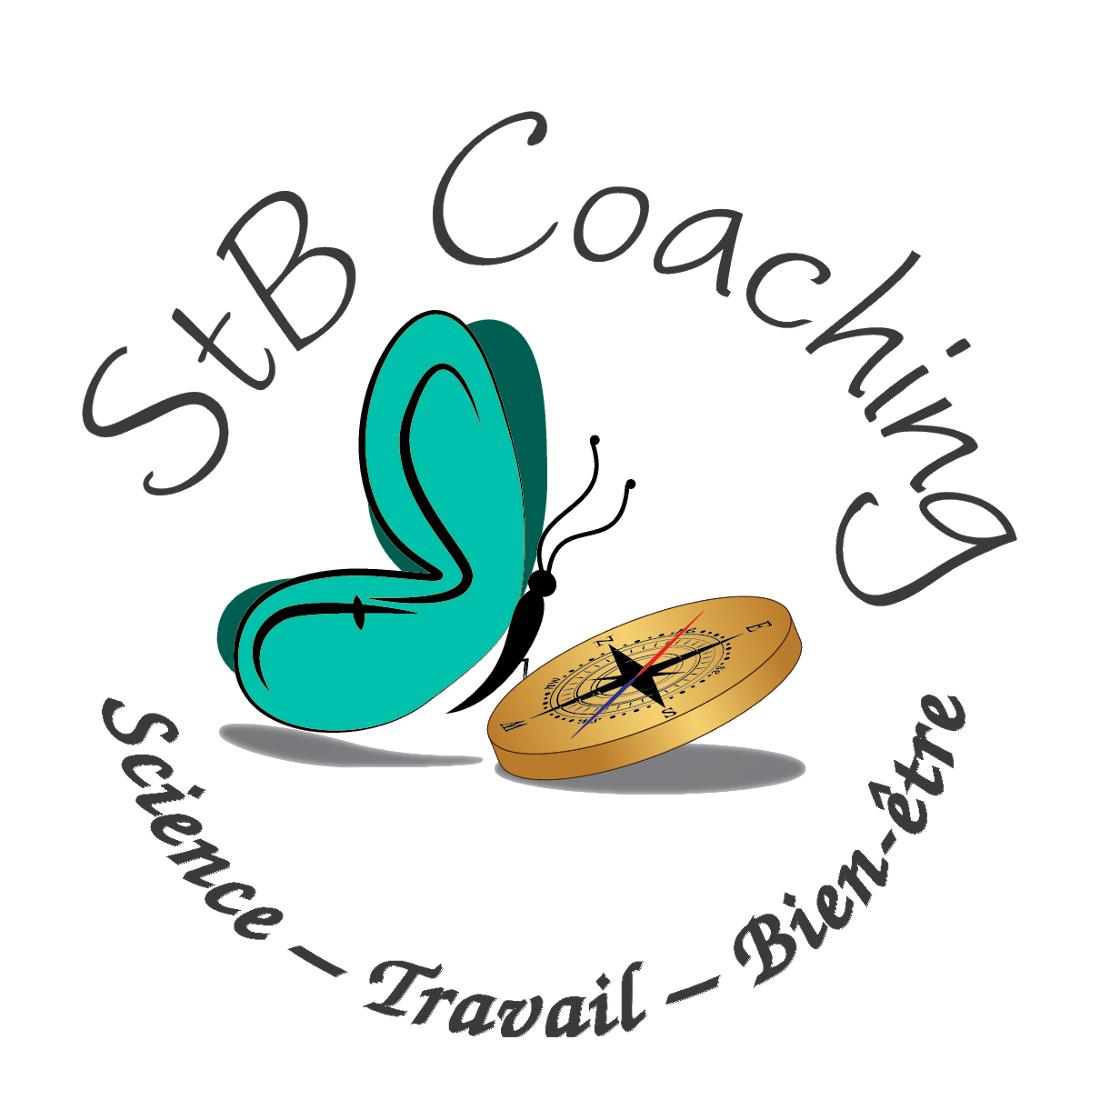 Logo StB coaching en Belgique